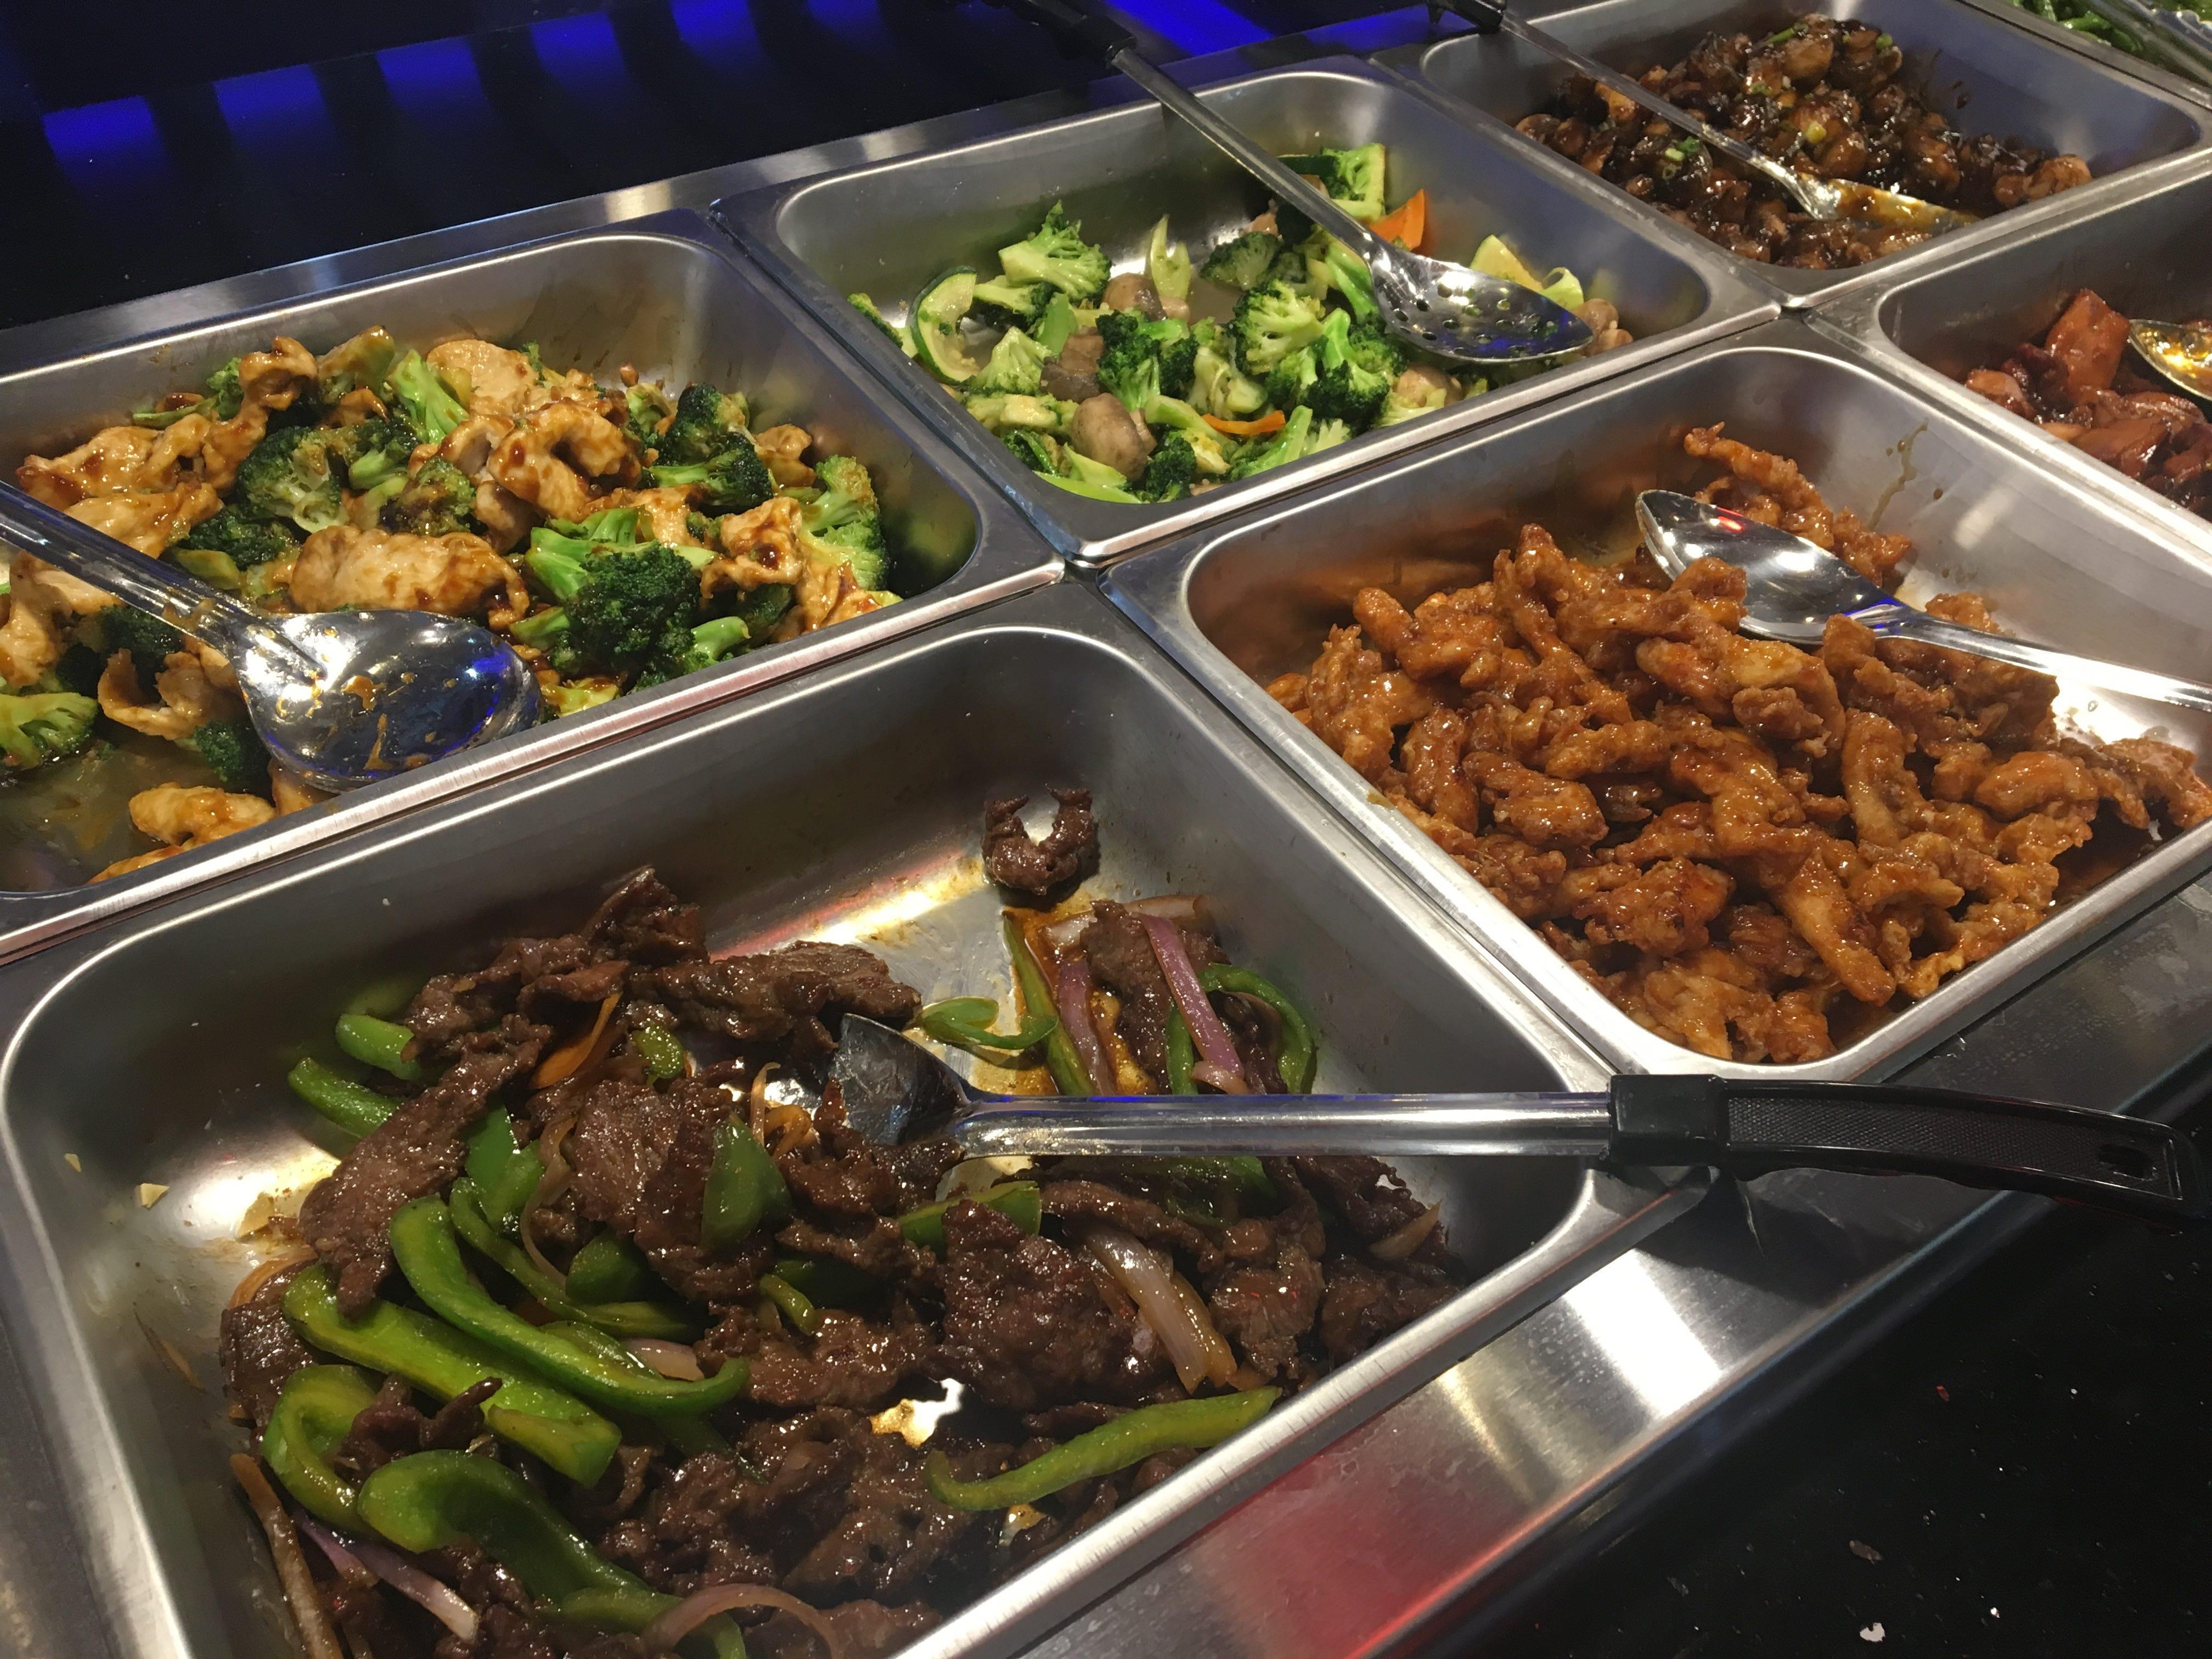 Yoki Buffet favorites include beef pepper steak, Thailand chicken and vegetable stir fry.